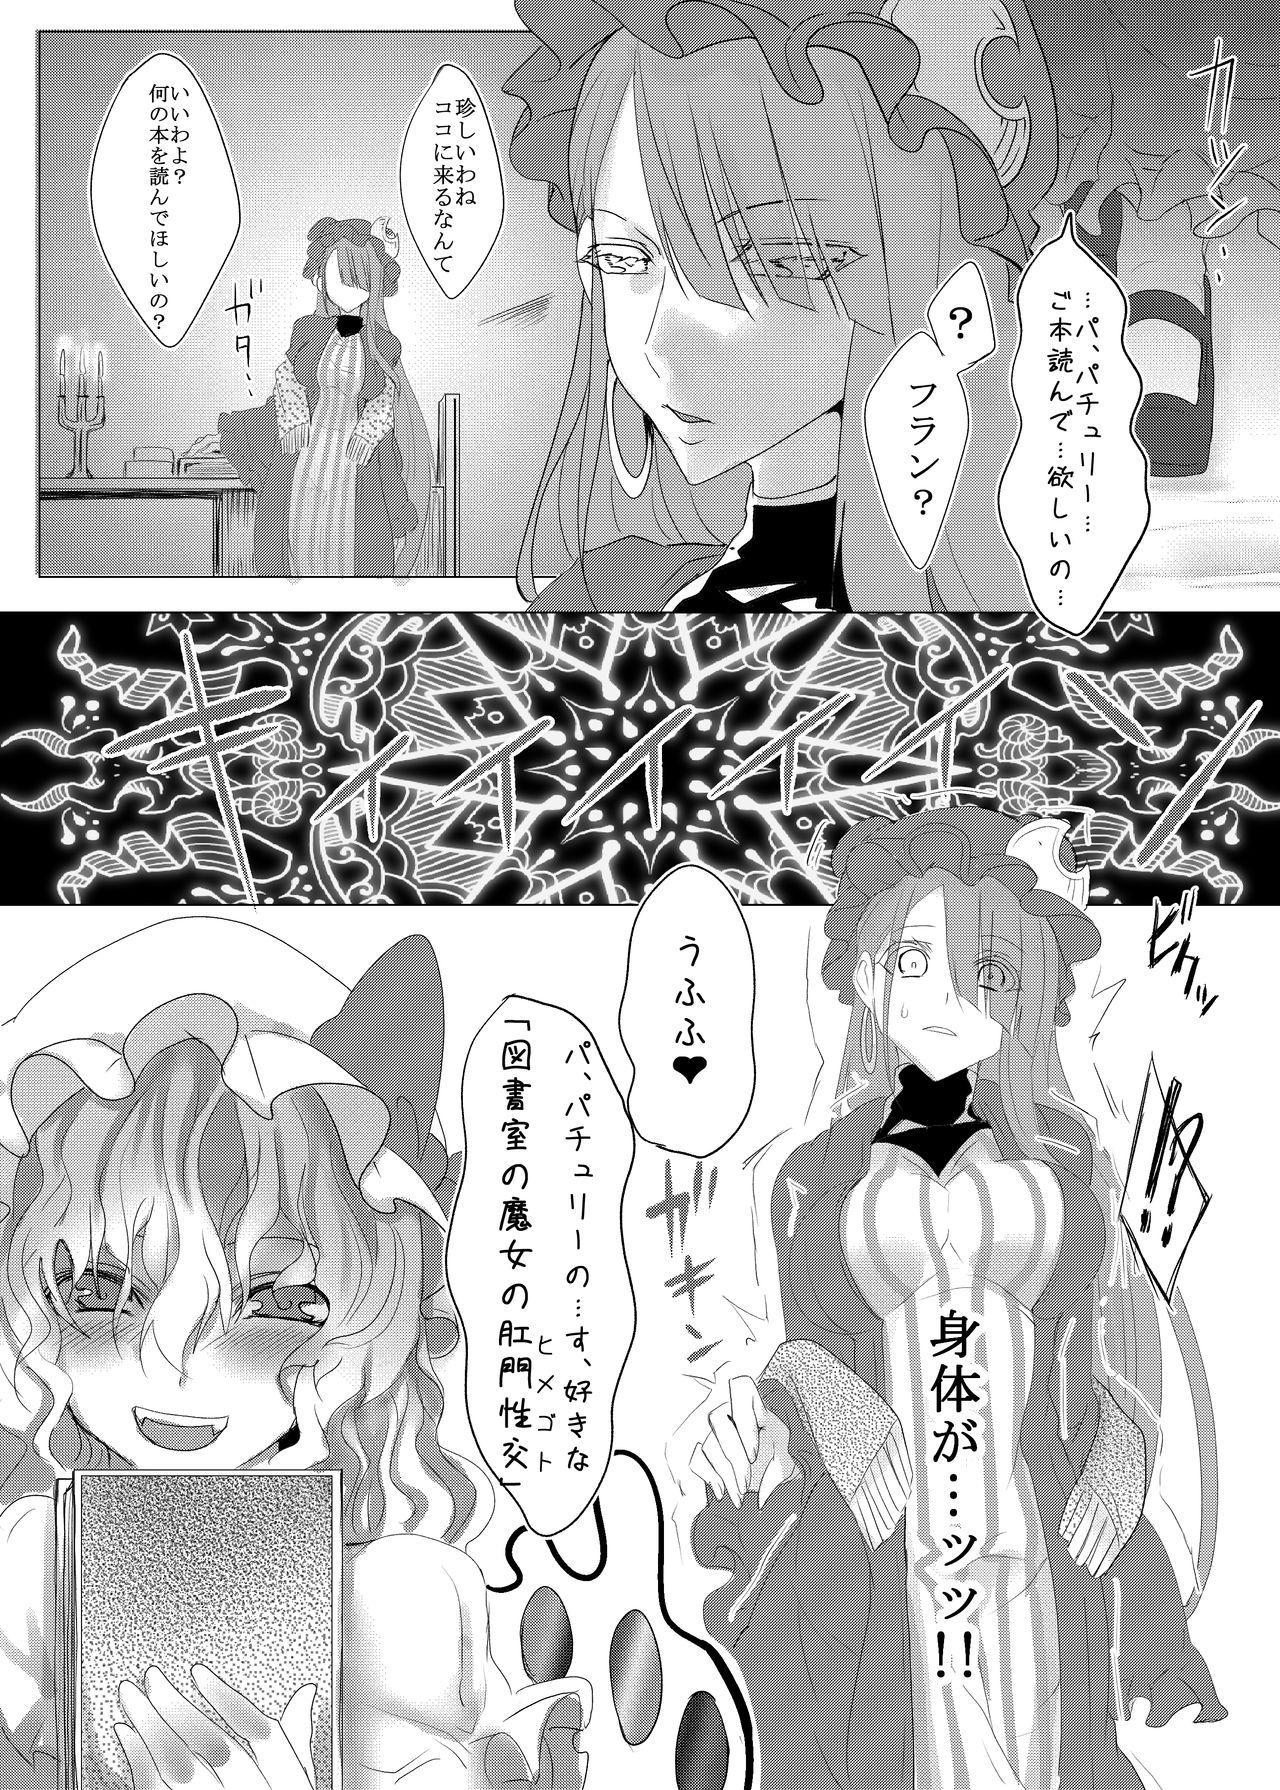 [Nakamura Nawo.] Four-of-a-Kind-chan-tachi ga Koumakan o Naburi ni Iku Hon (Touhou Project) 13